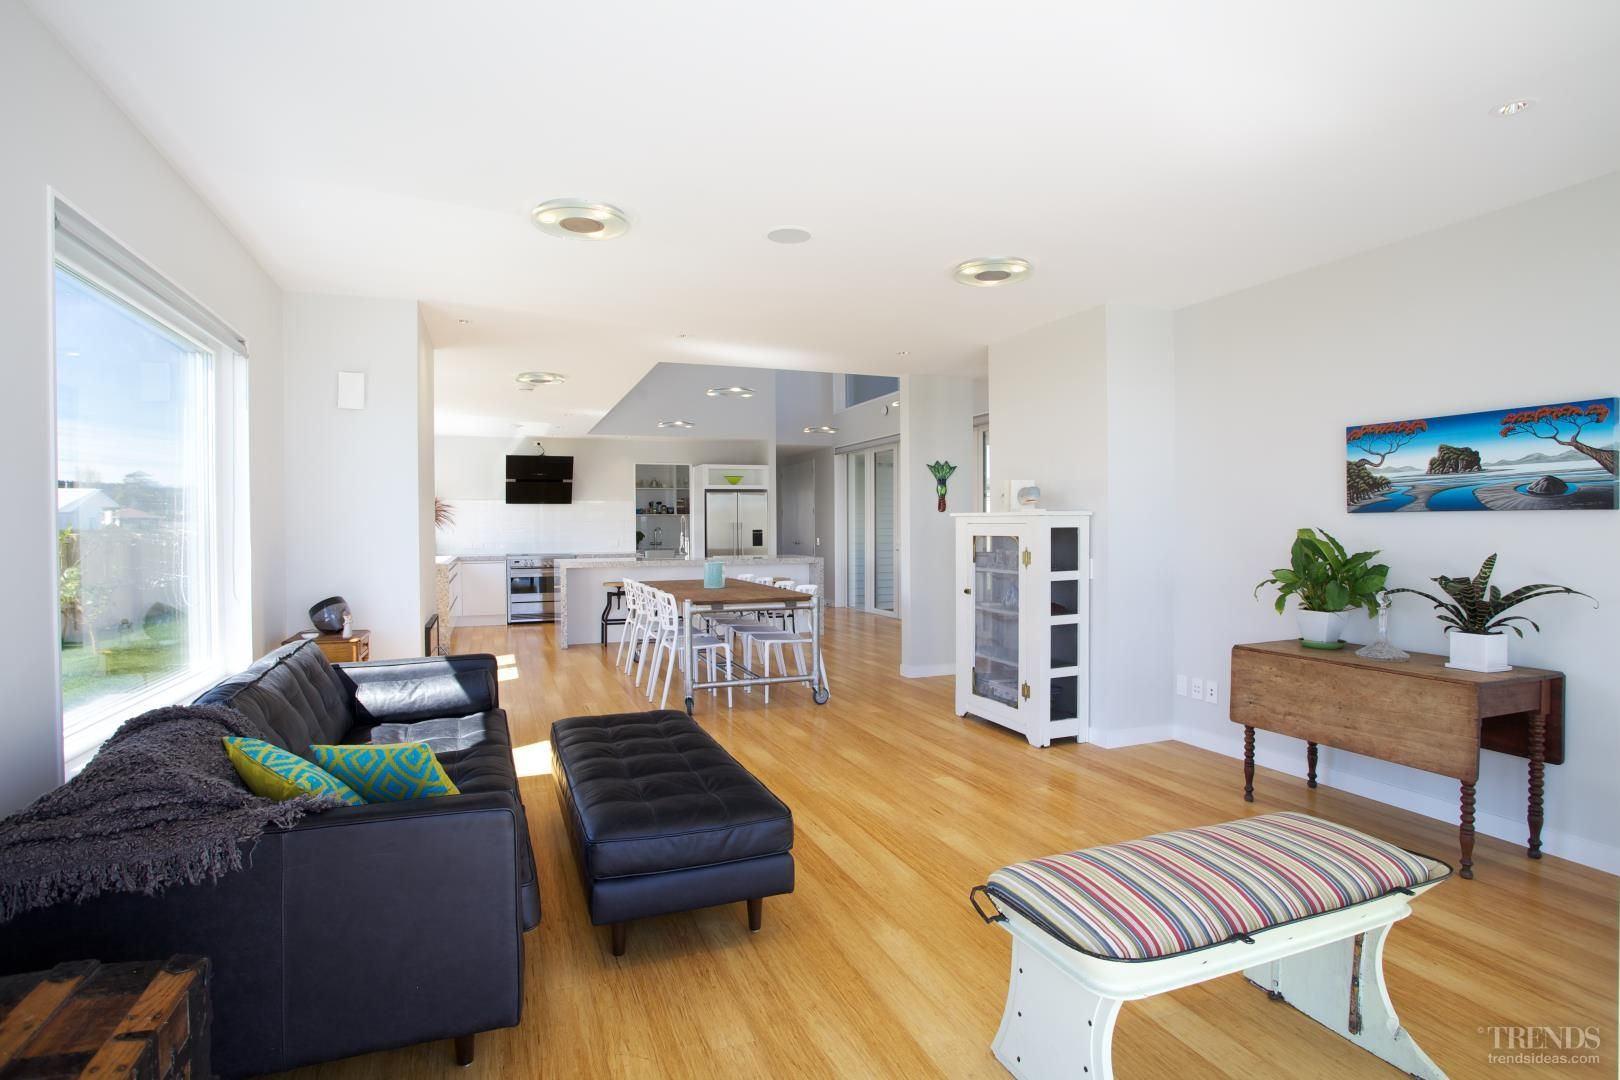 ideal house designed to 8 homestar design rating german passivhaus